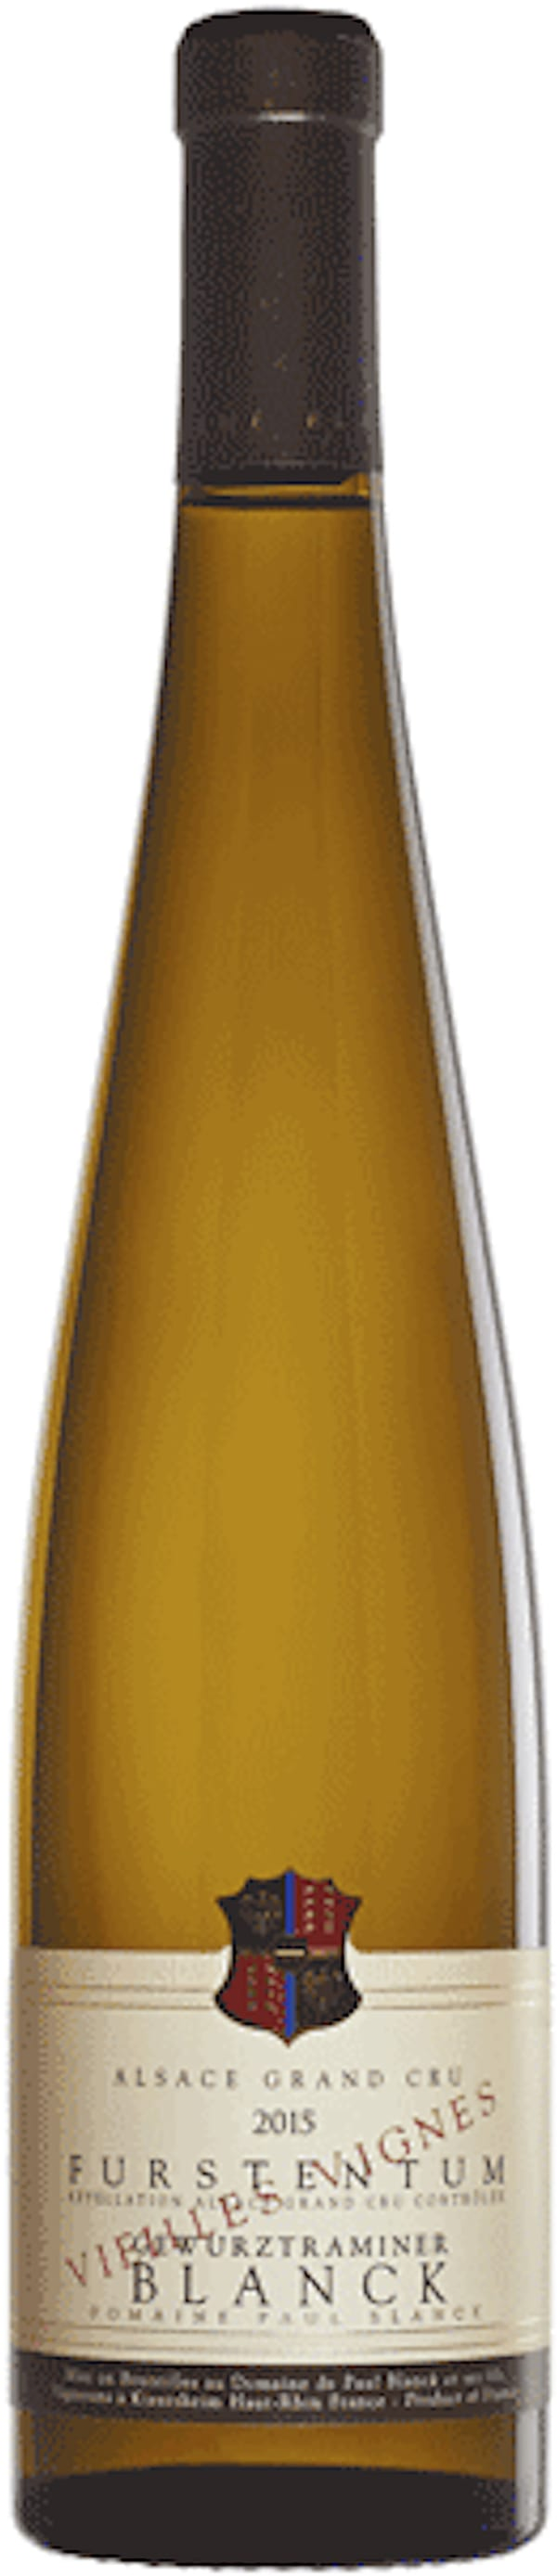 Paul Blanck Gewurztraminer Furstentum Grand Cru Vieilles Vignes 2015